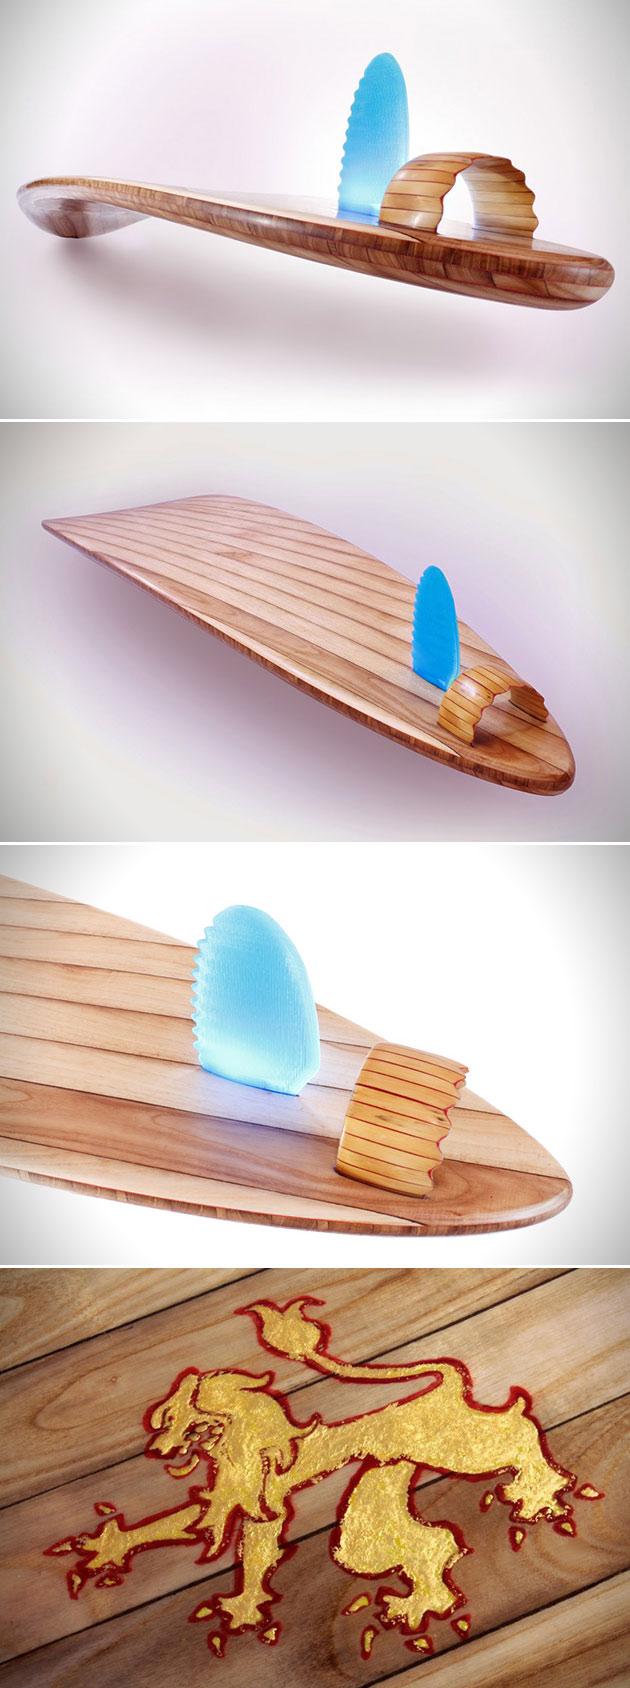 Rampant Surfboard 3D-Printed Fin